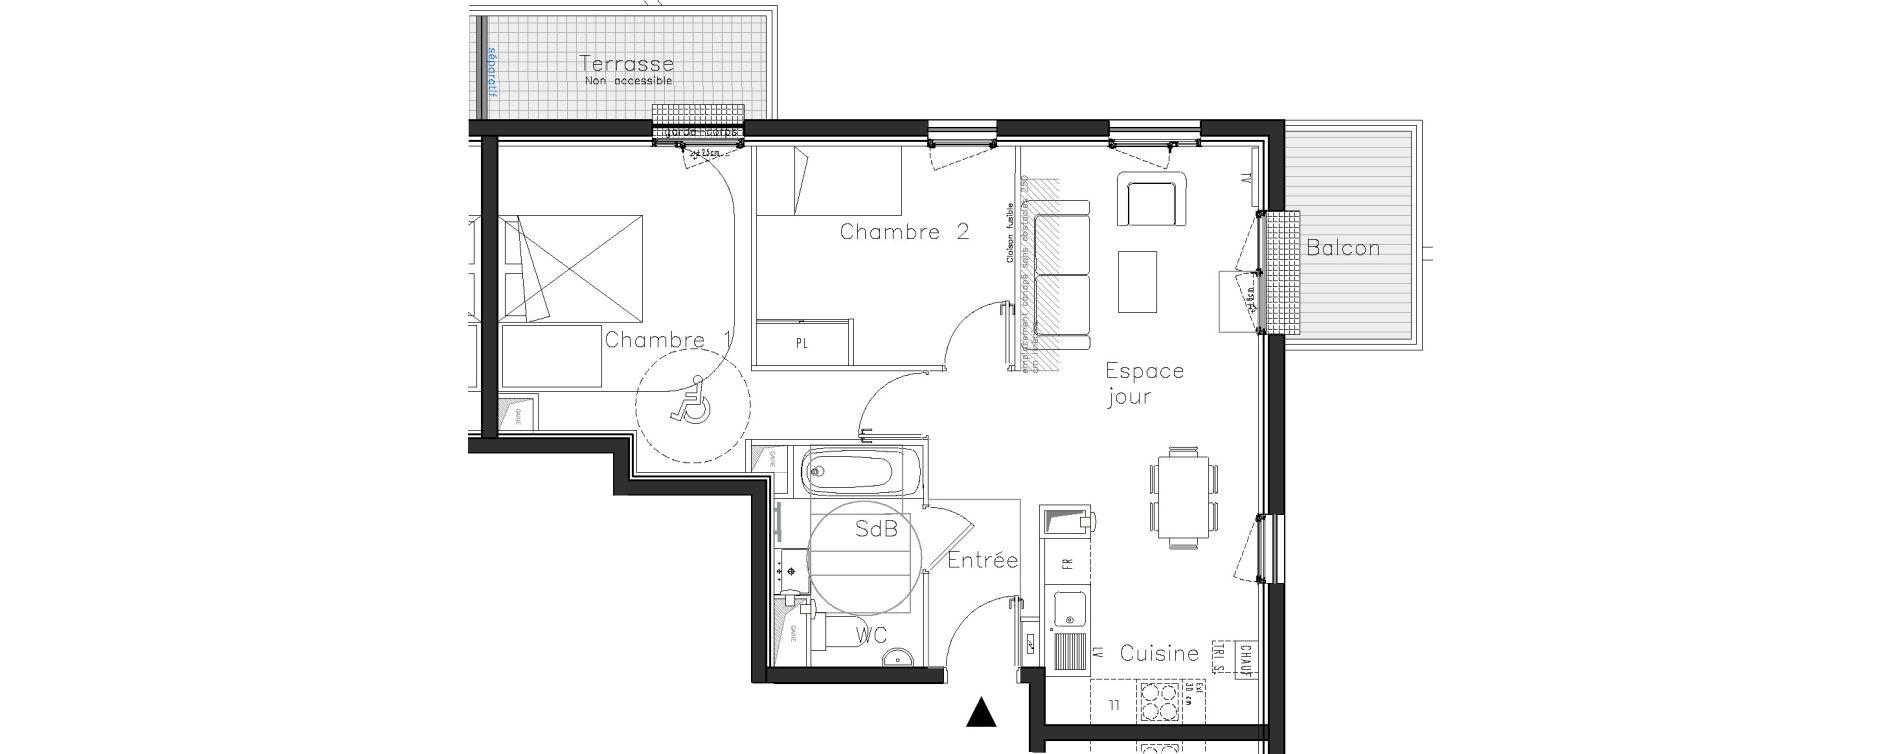 Plan T3 neuf à Moissy-Cramayel de